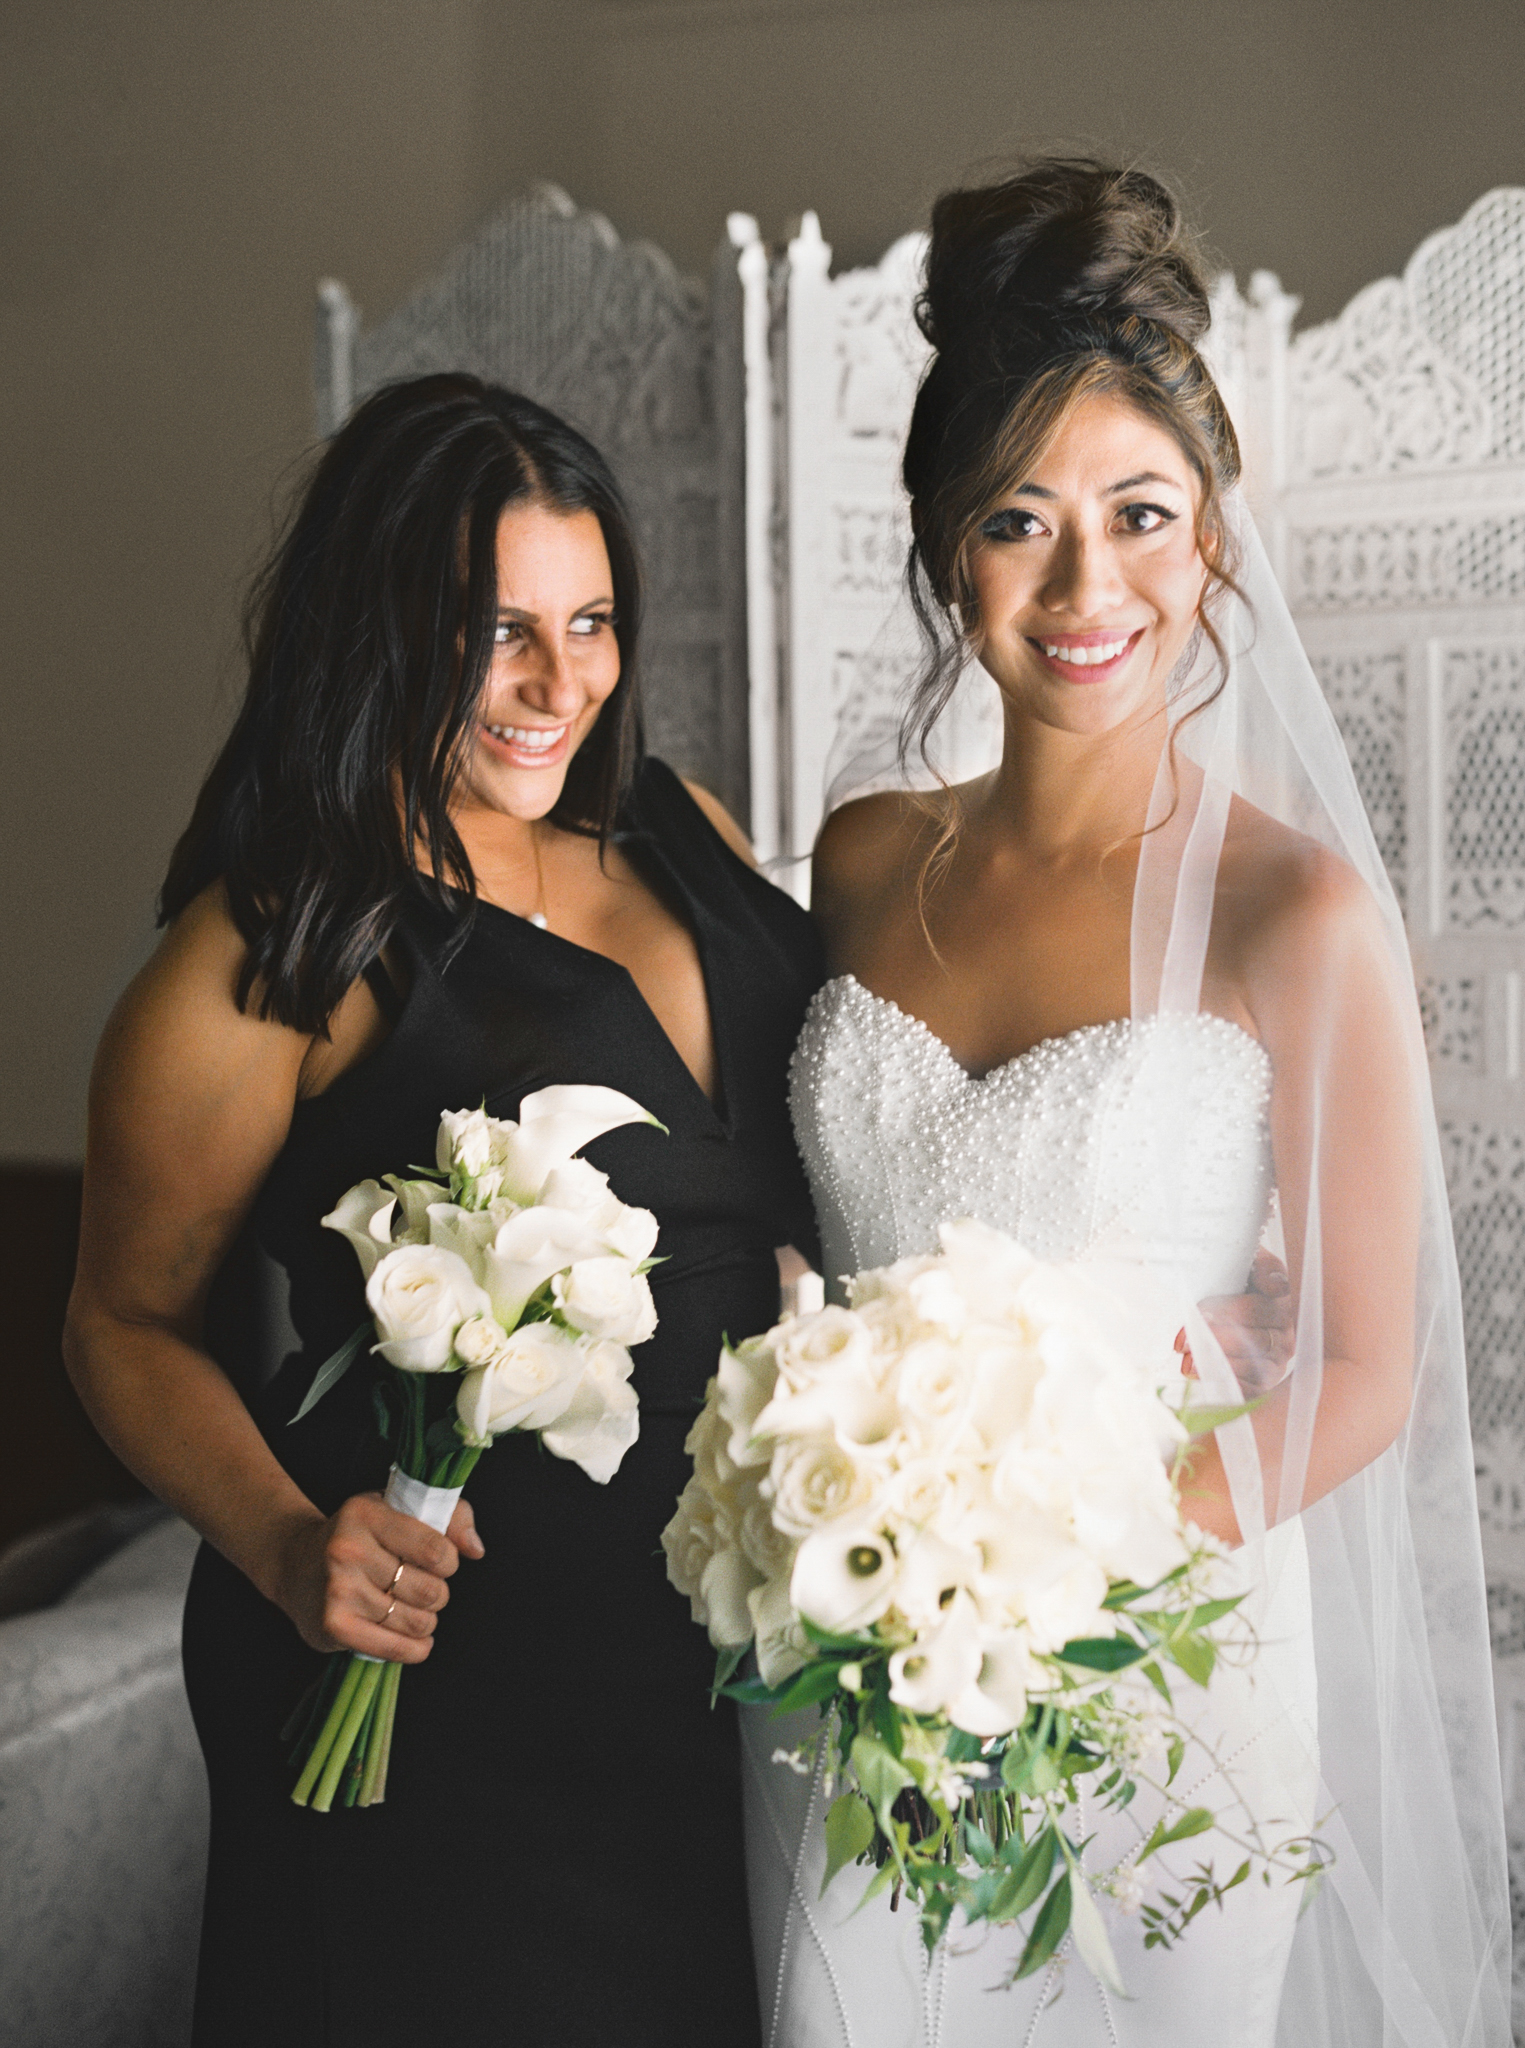 034OutliveCreative_Travel_Photographer_Videographer_Lewis&Clark_Oregon_Elegant_BlackTie_Destination_Wedding.jpg